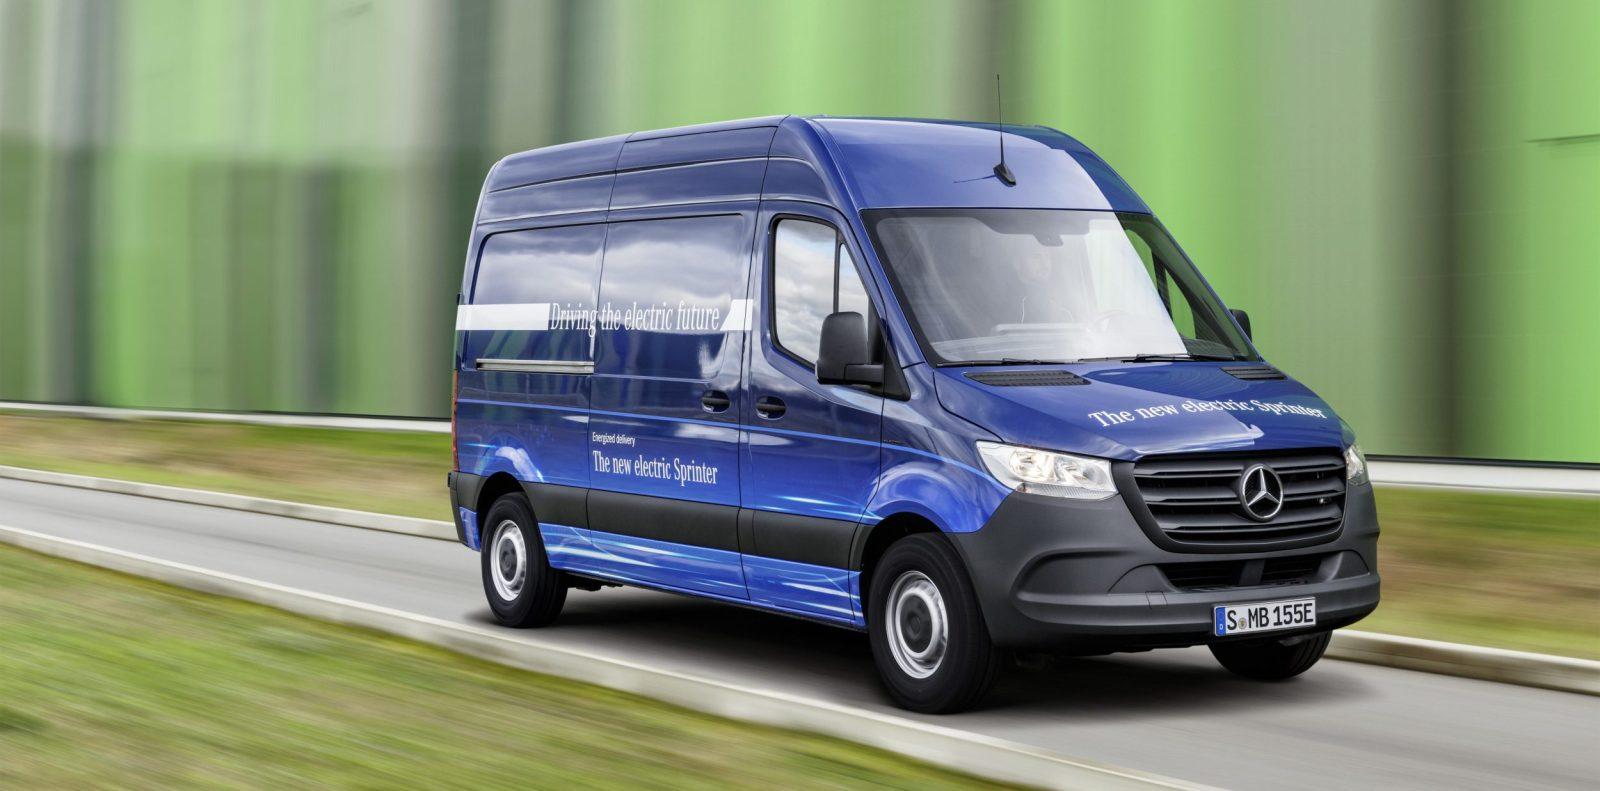 Mercedes-Benz unveils new eSprinter all-electric van with